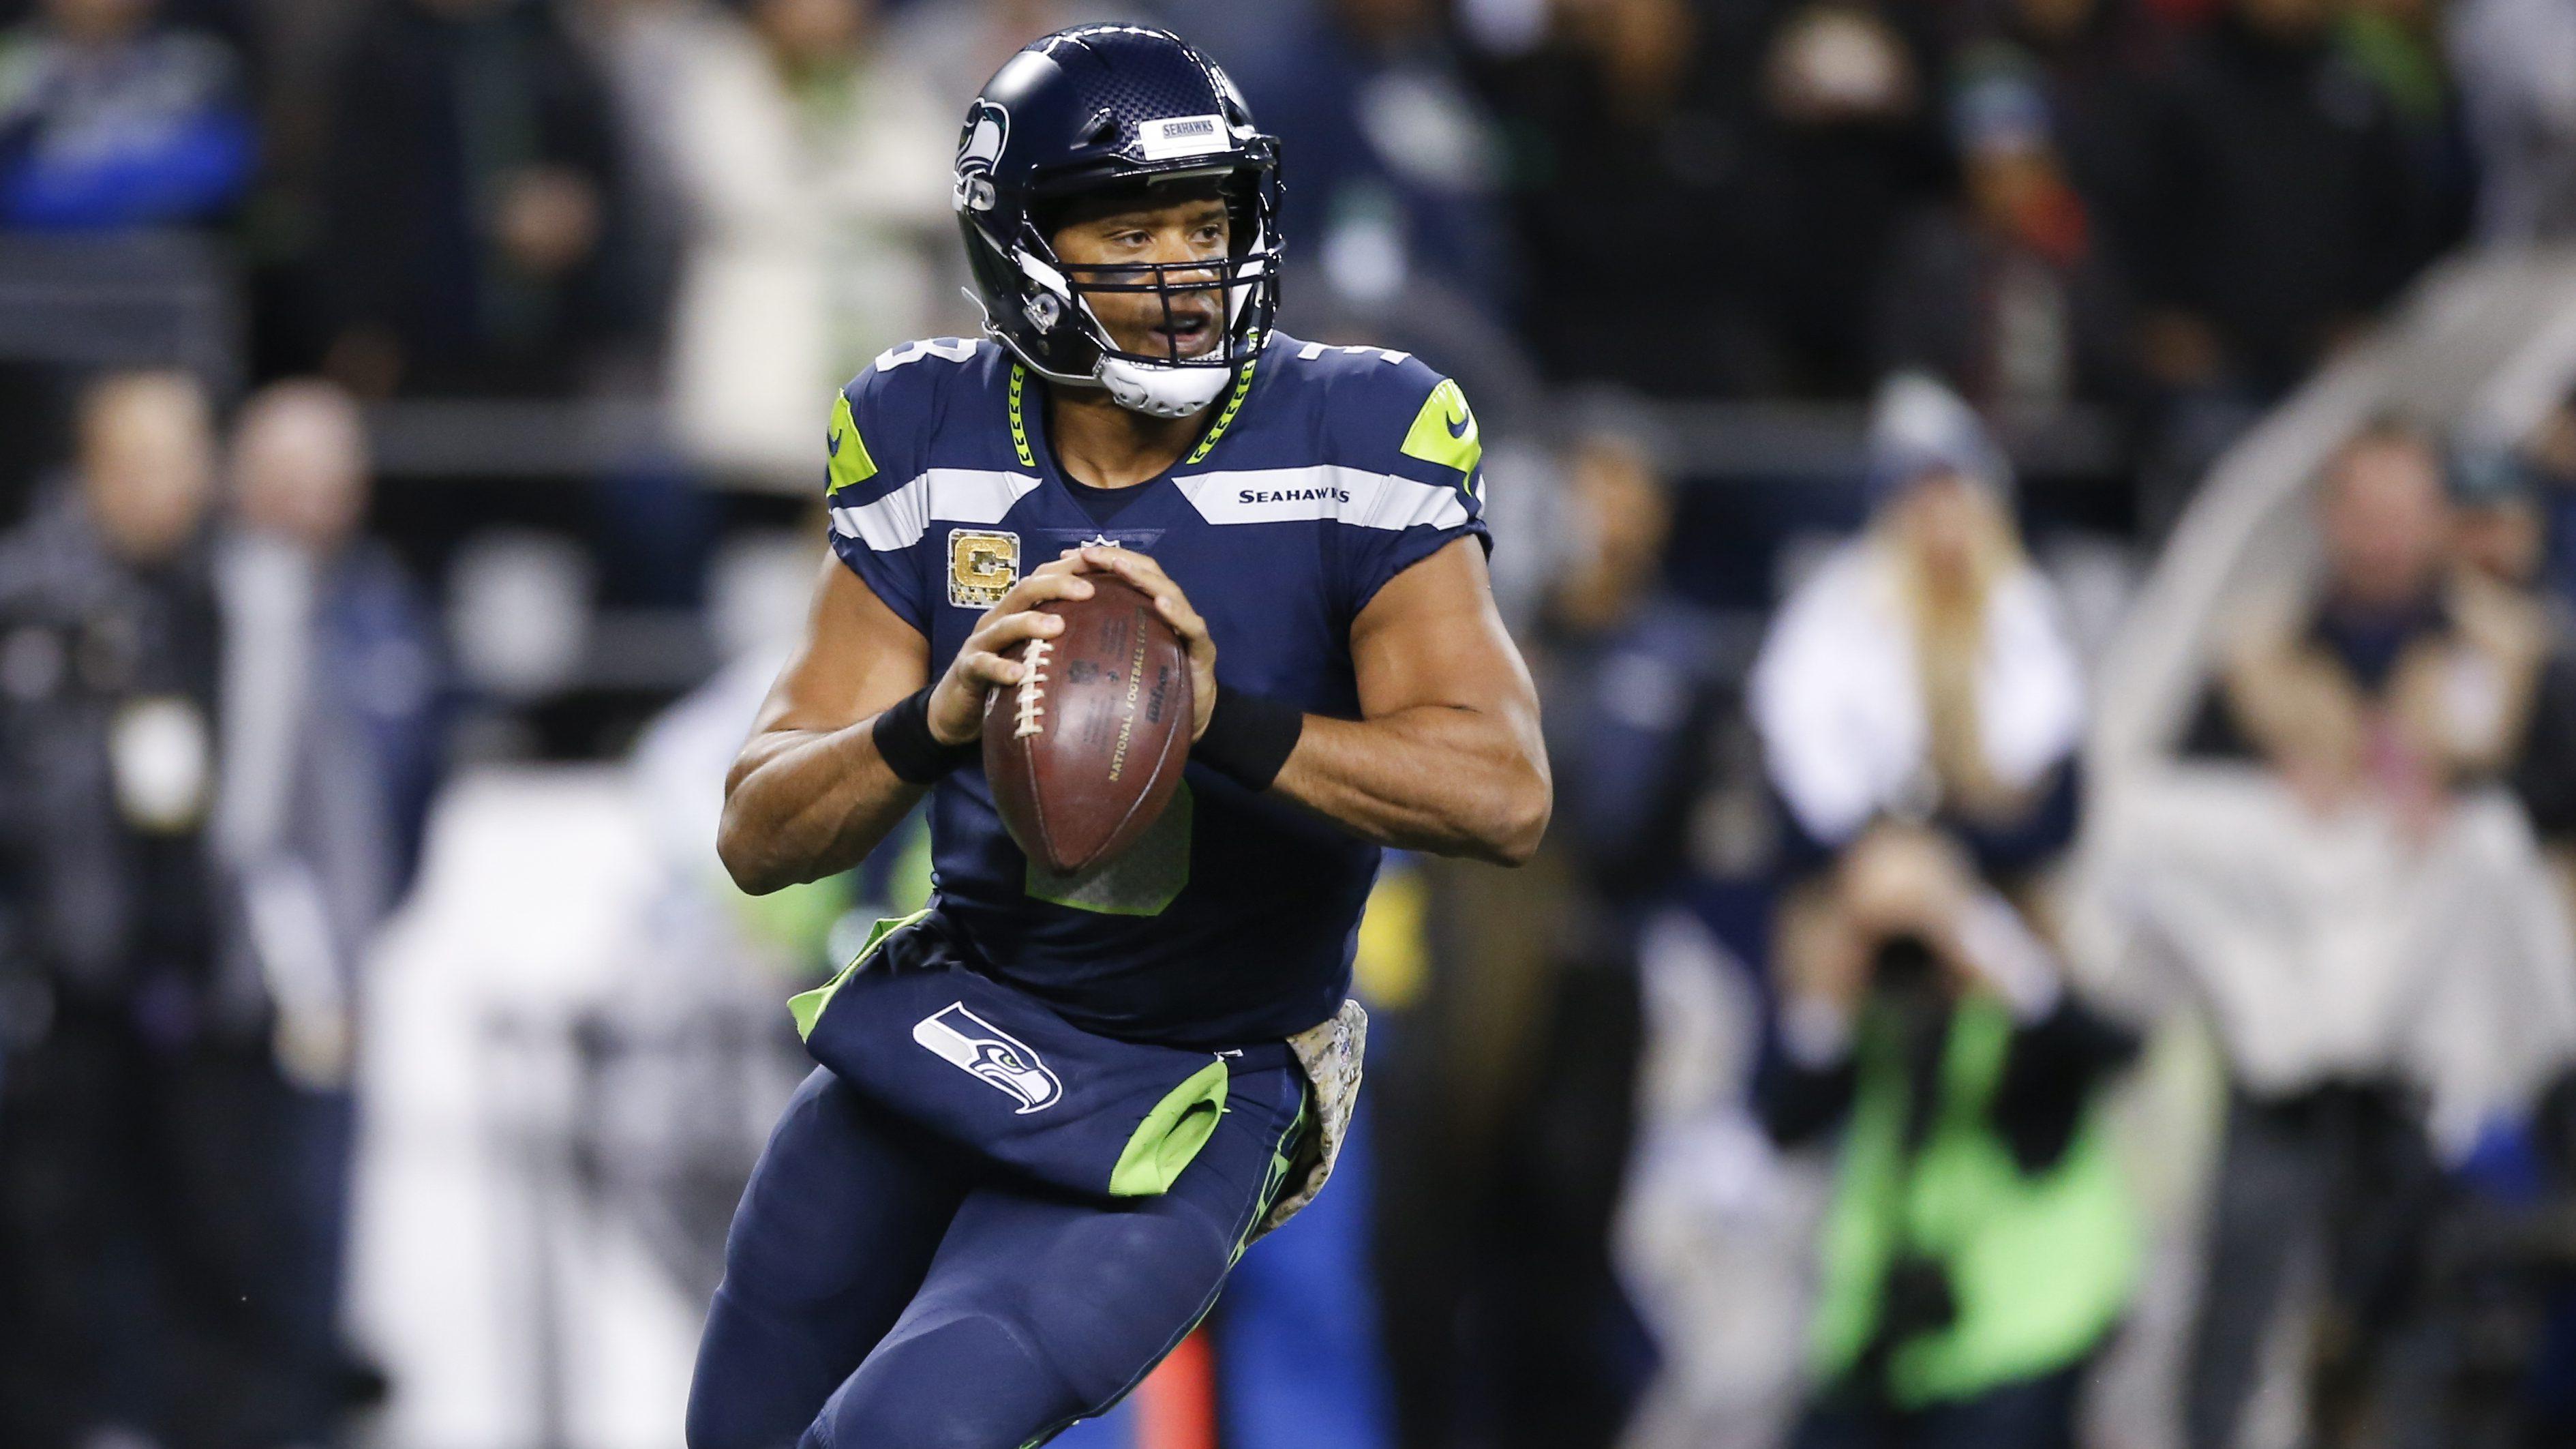 saints vs seahawks betting odds